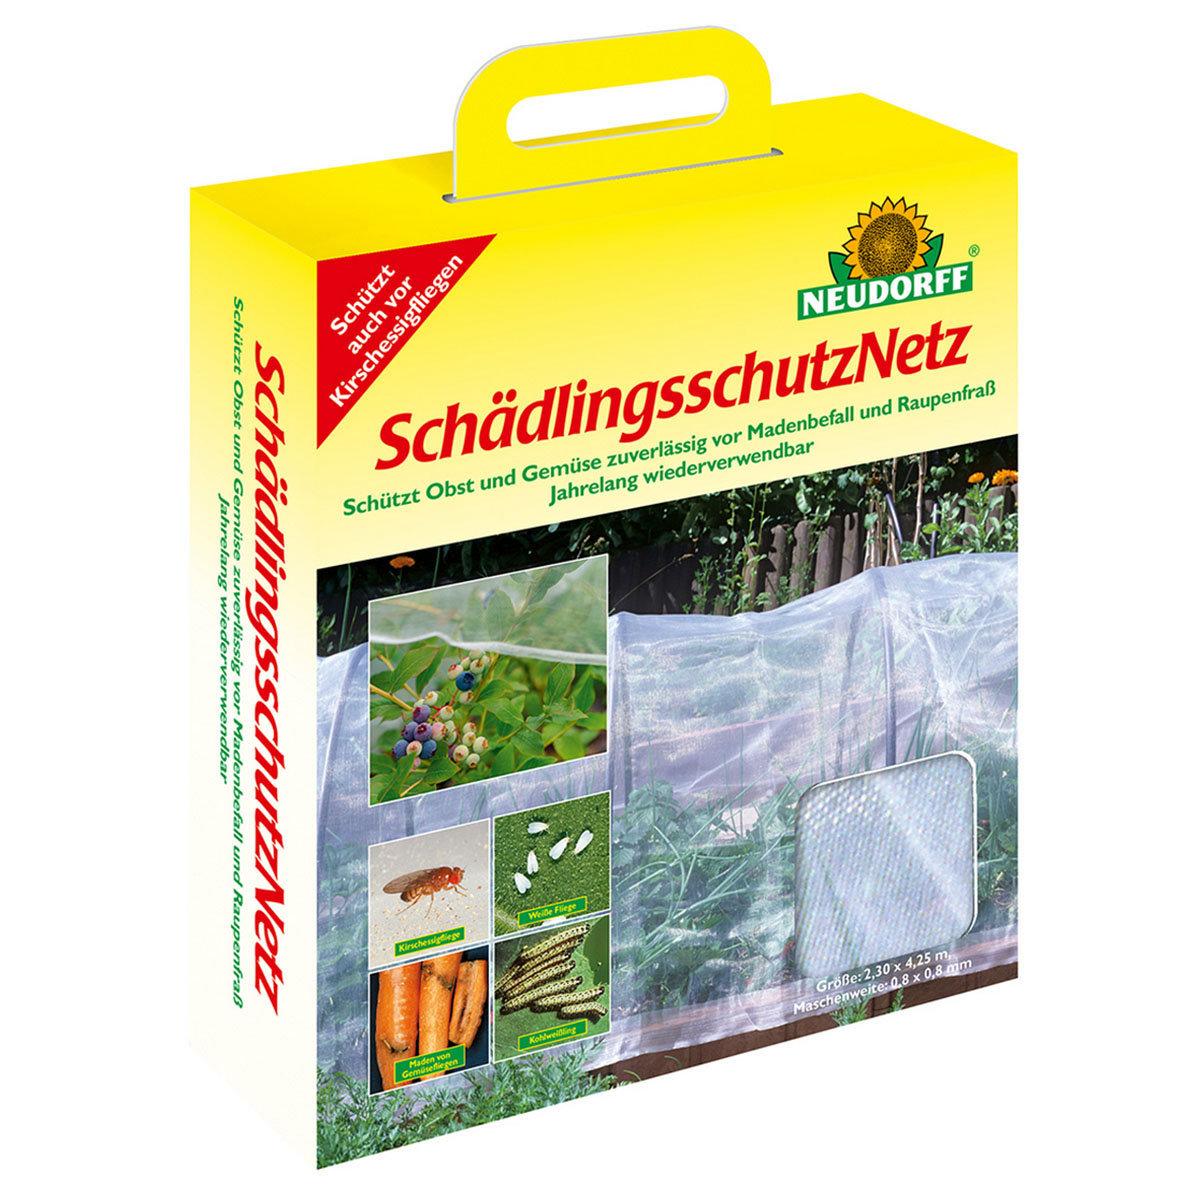 Schädlingsschutz Netz, ca. 230x425 cm